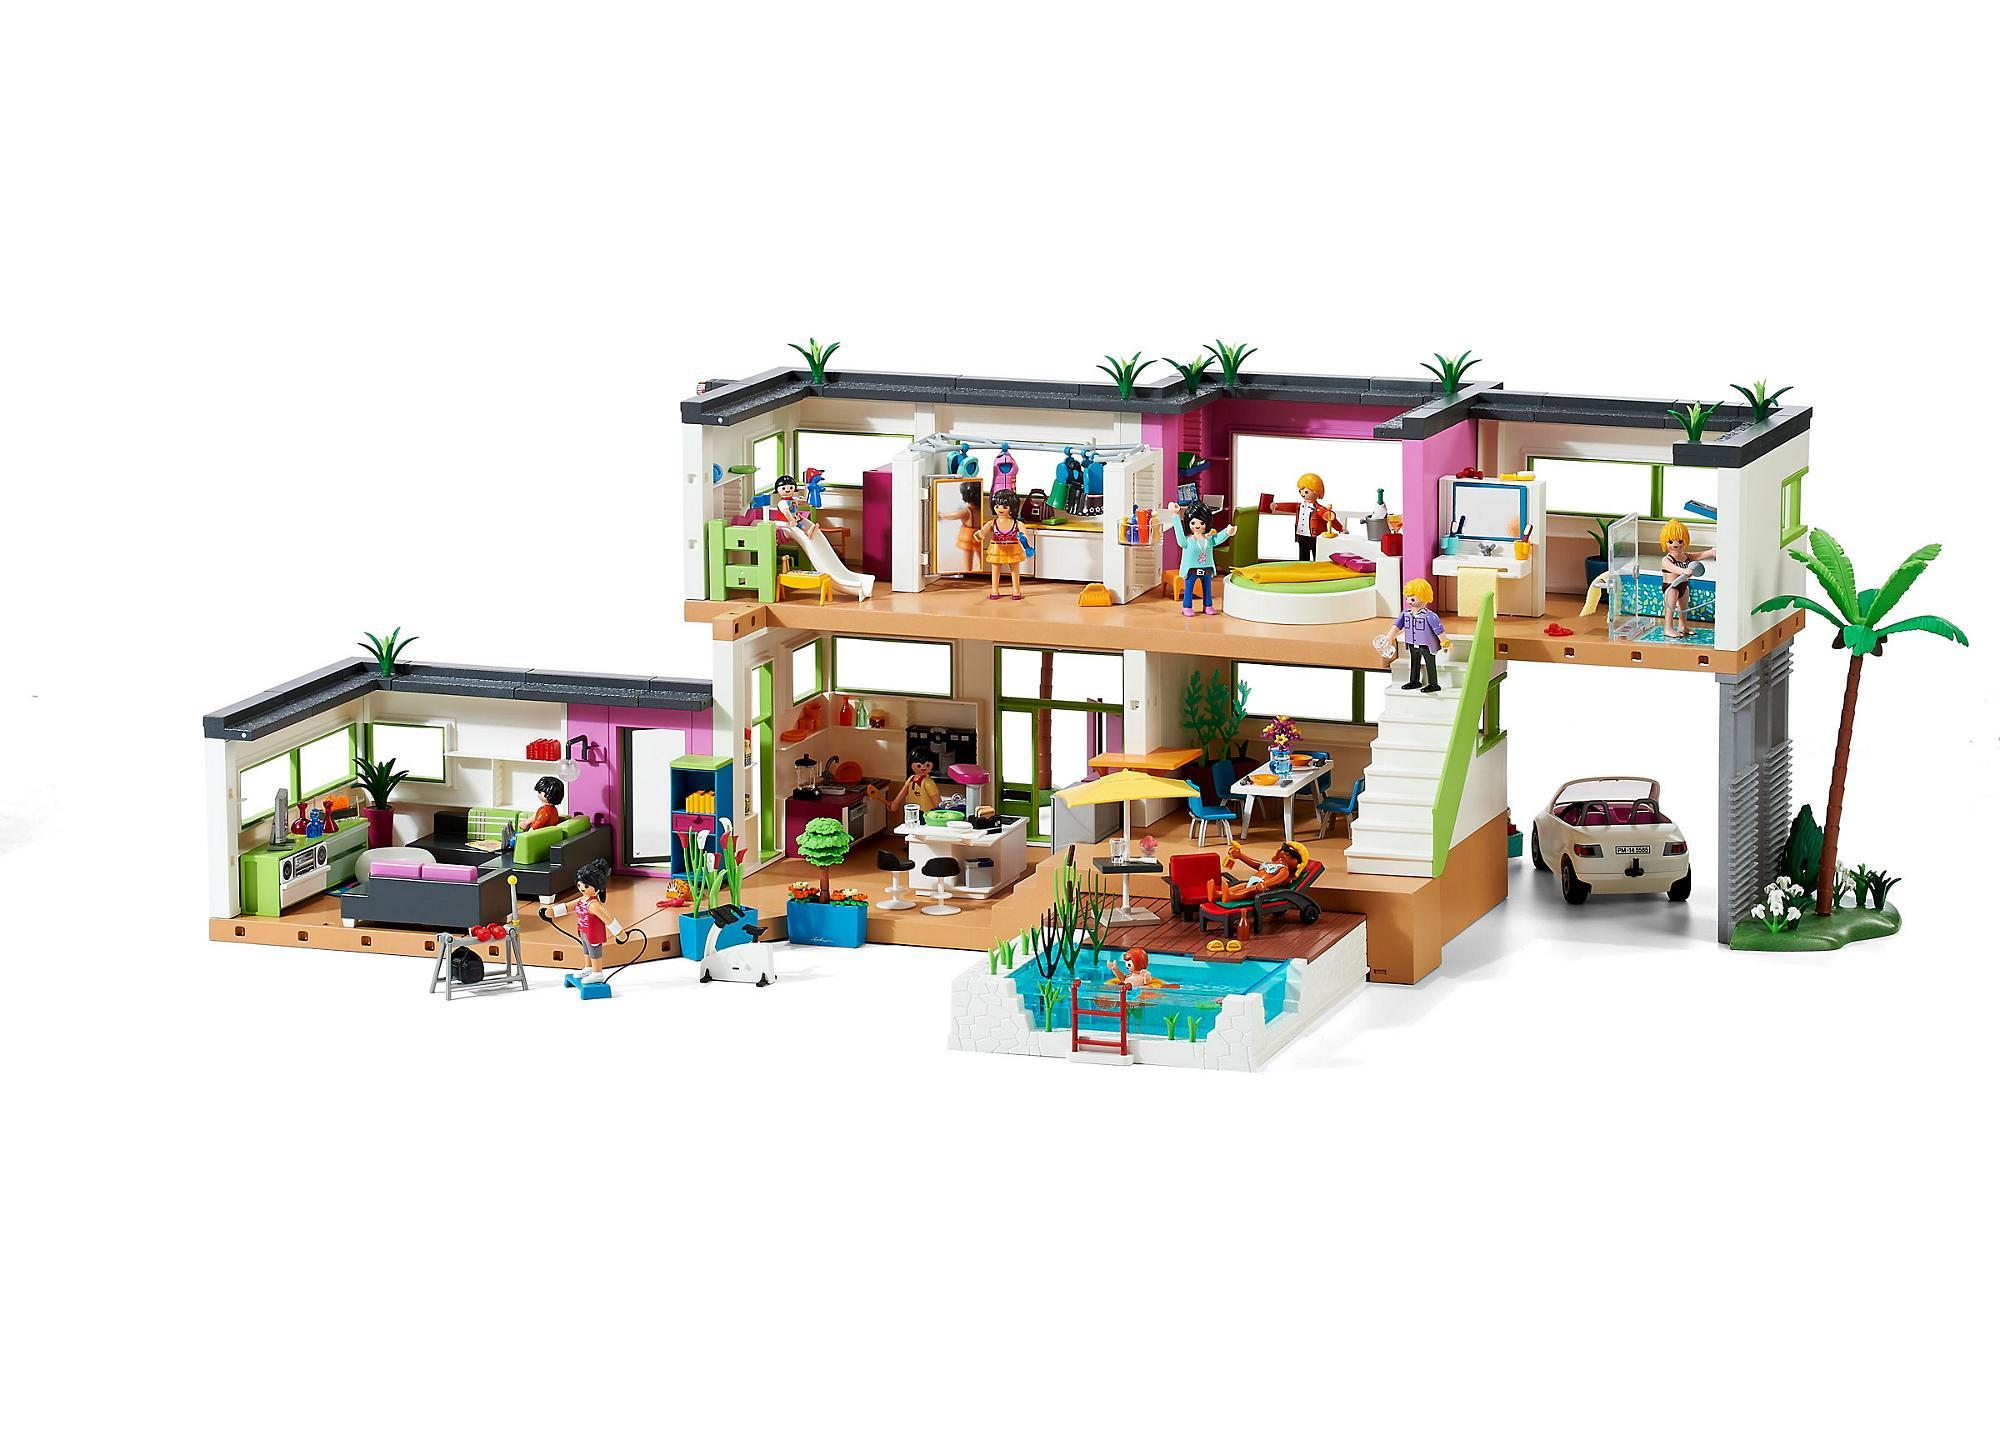 Maison Moderne 5574 Playmobil France